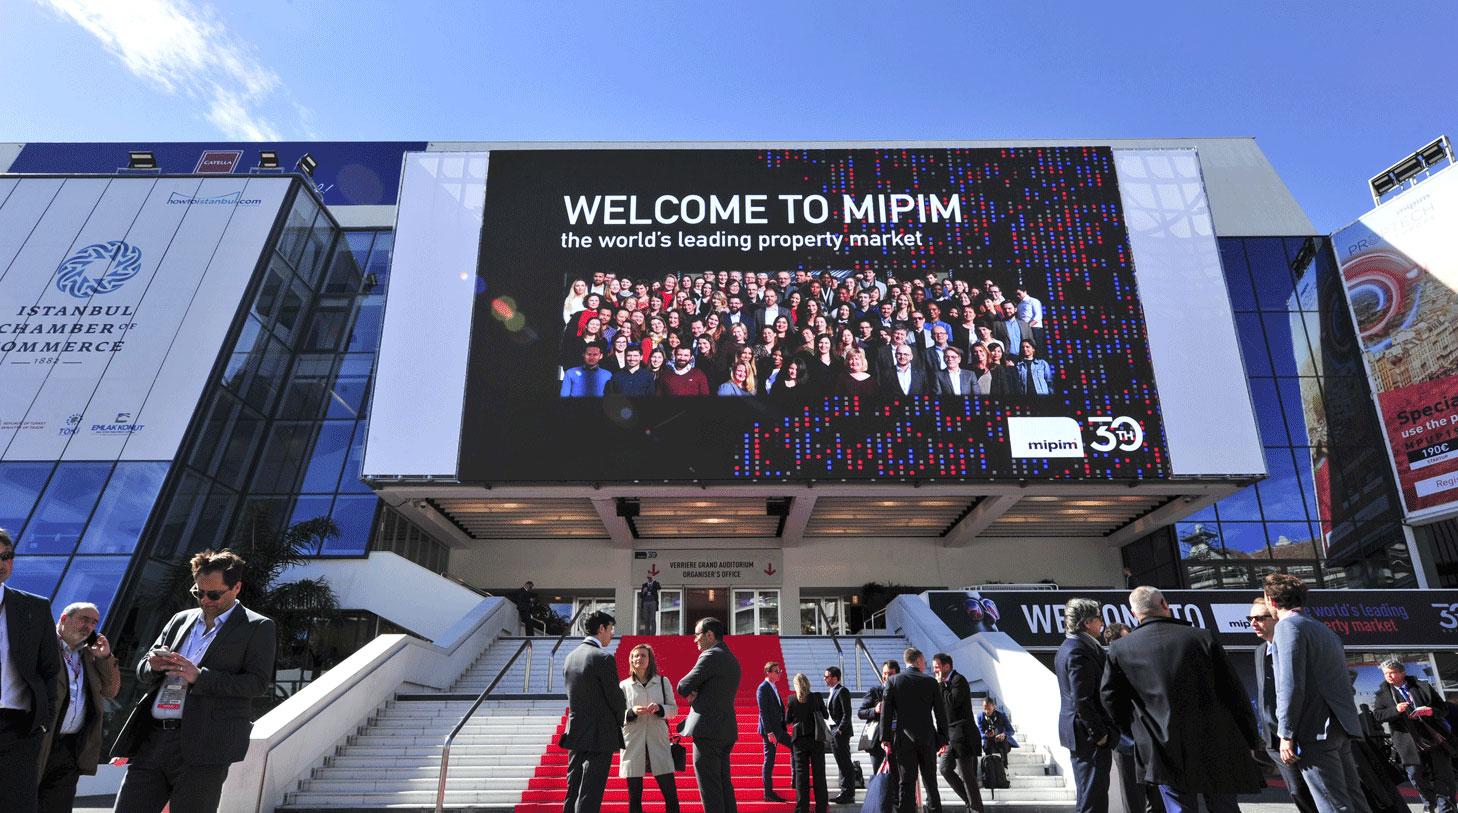 MIPIM confirmado para principios de Septiembre 2021